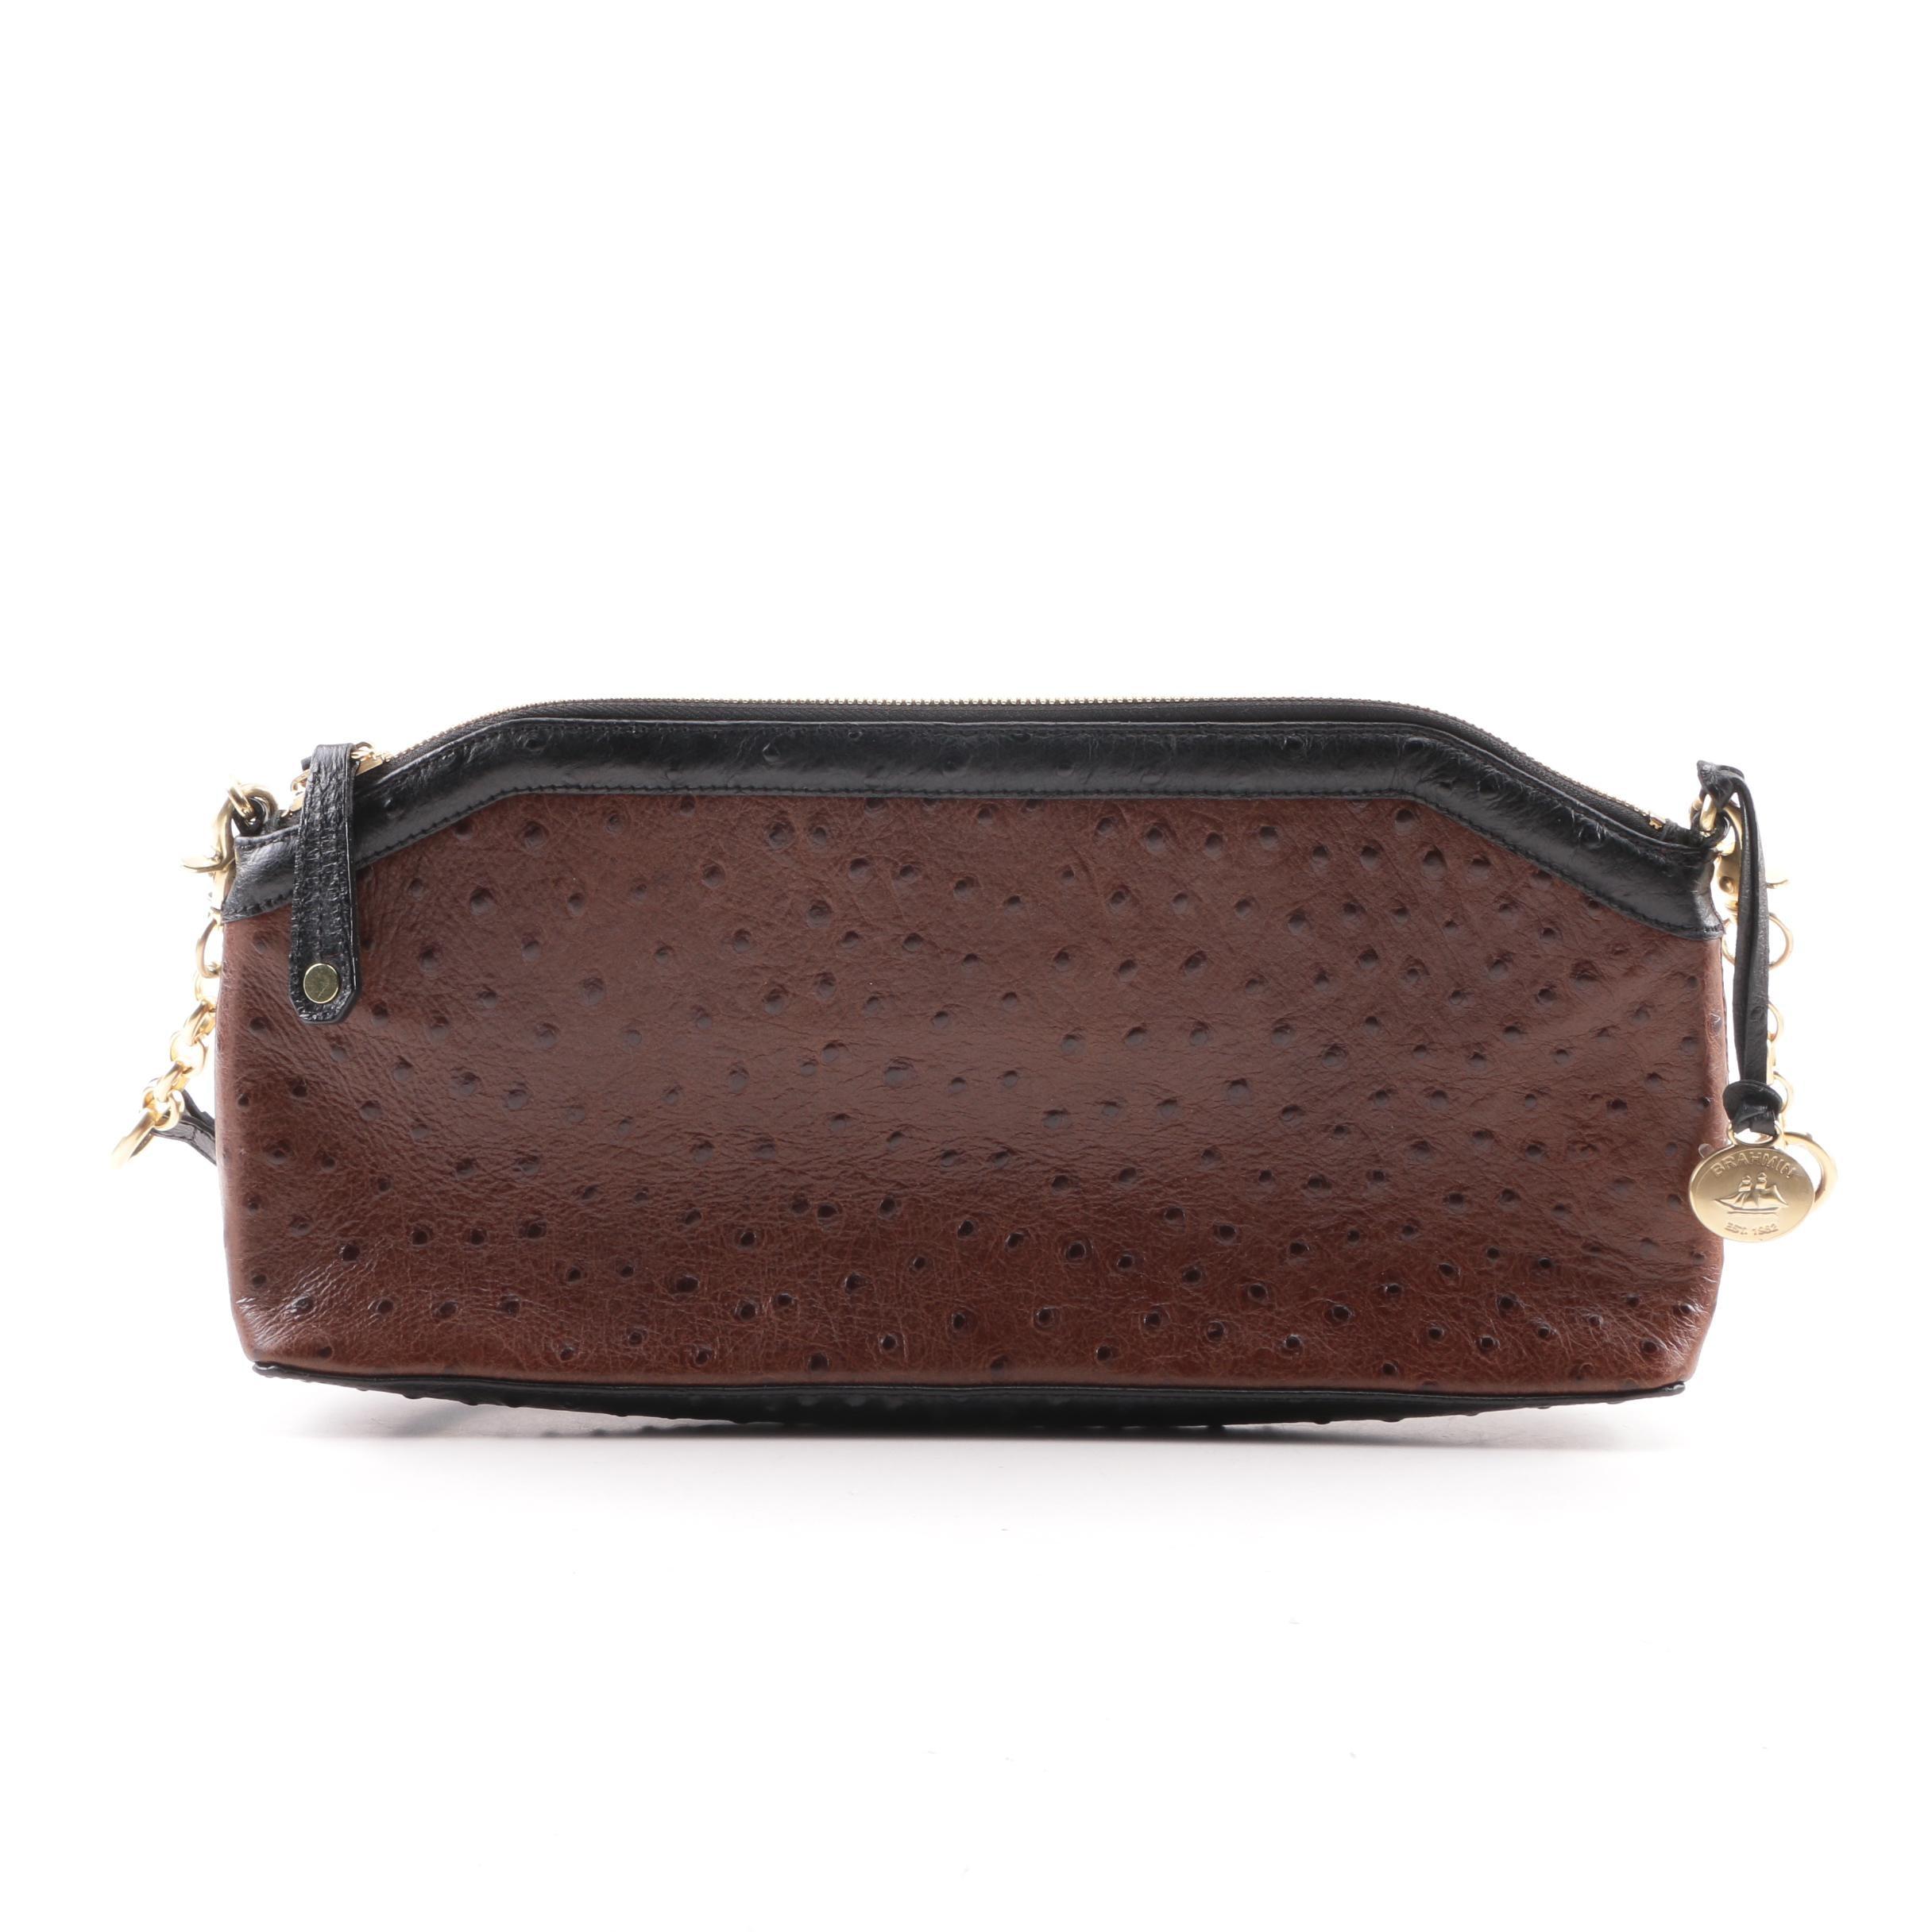 Brahmin Ostrich Embossed Brown Leather Top Handle Bag